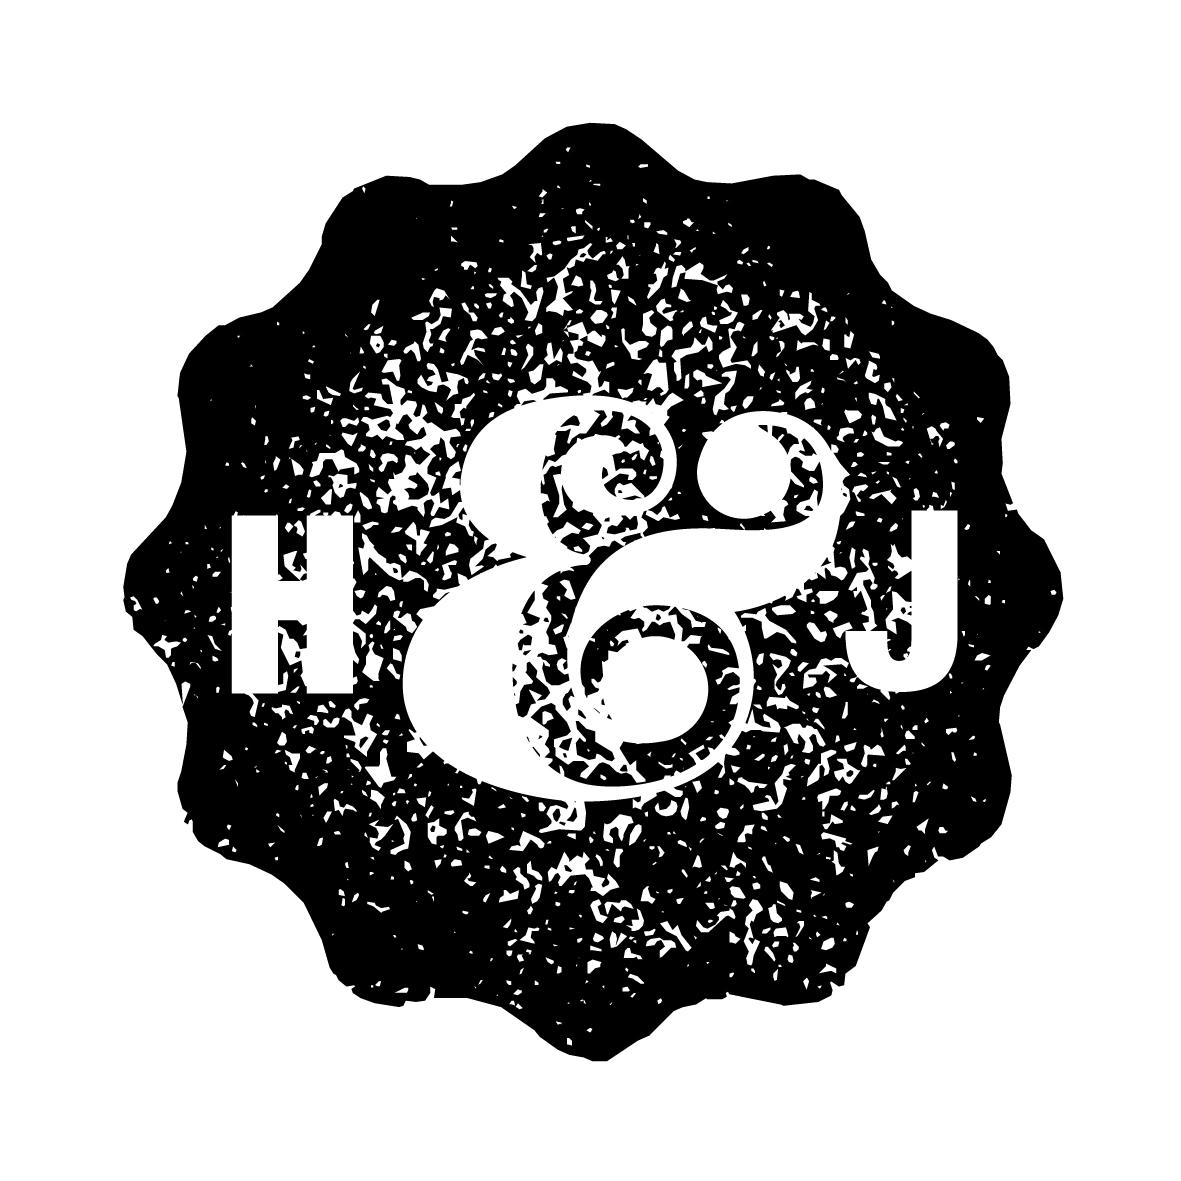 Henny & Joes